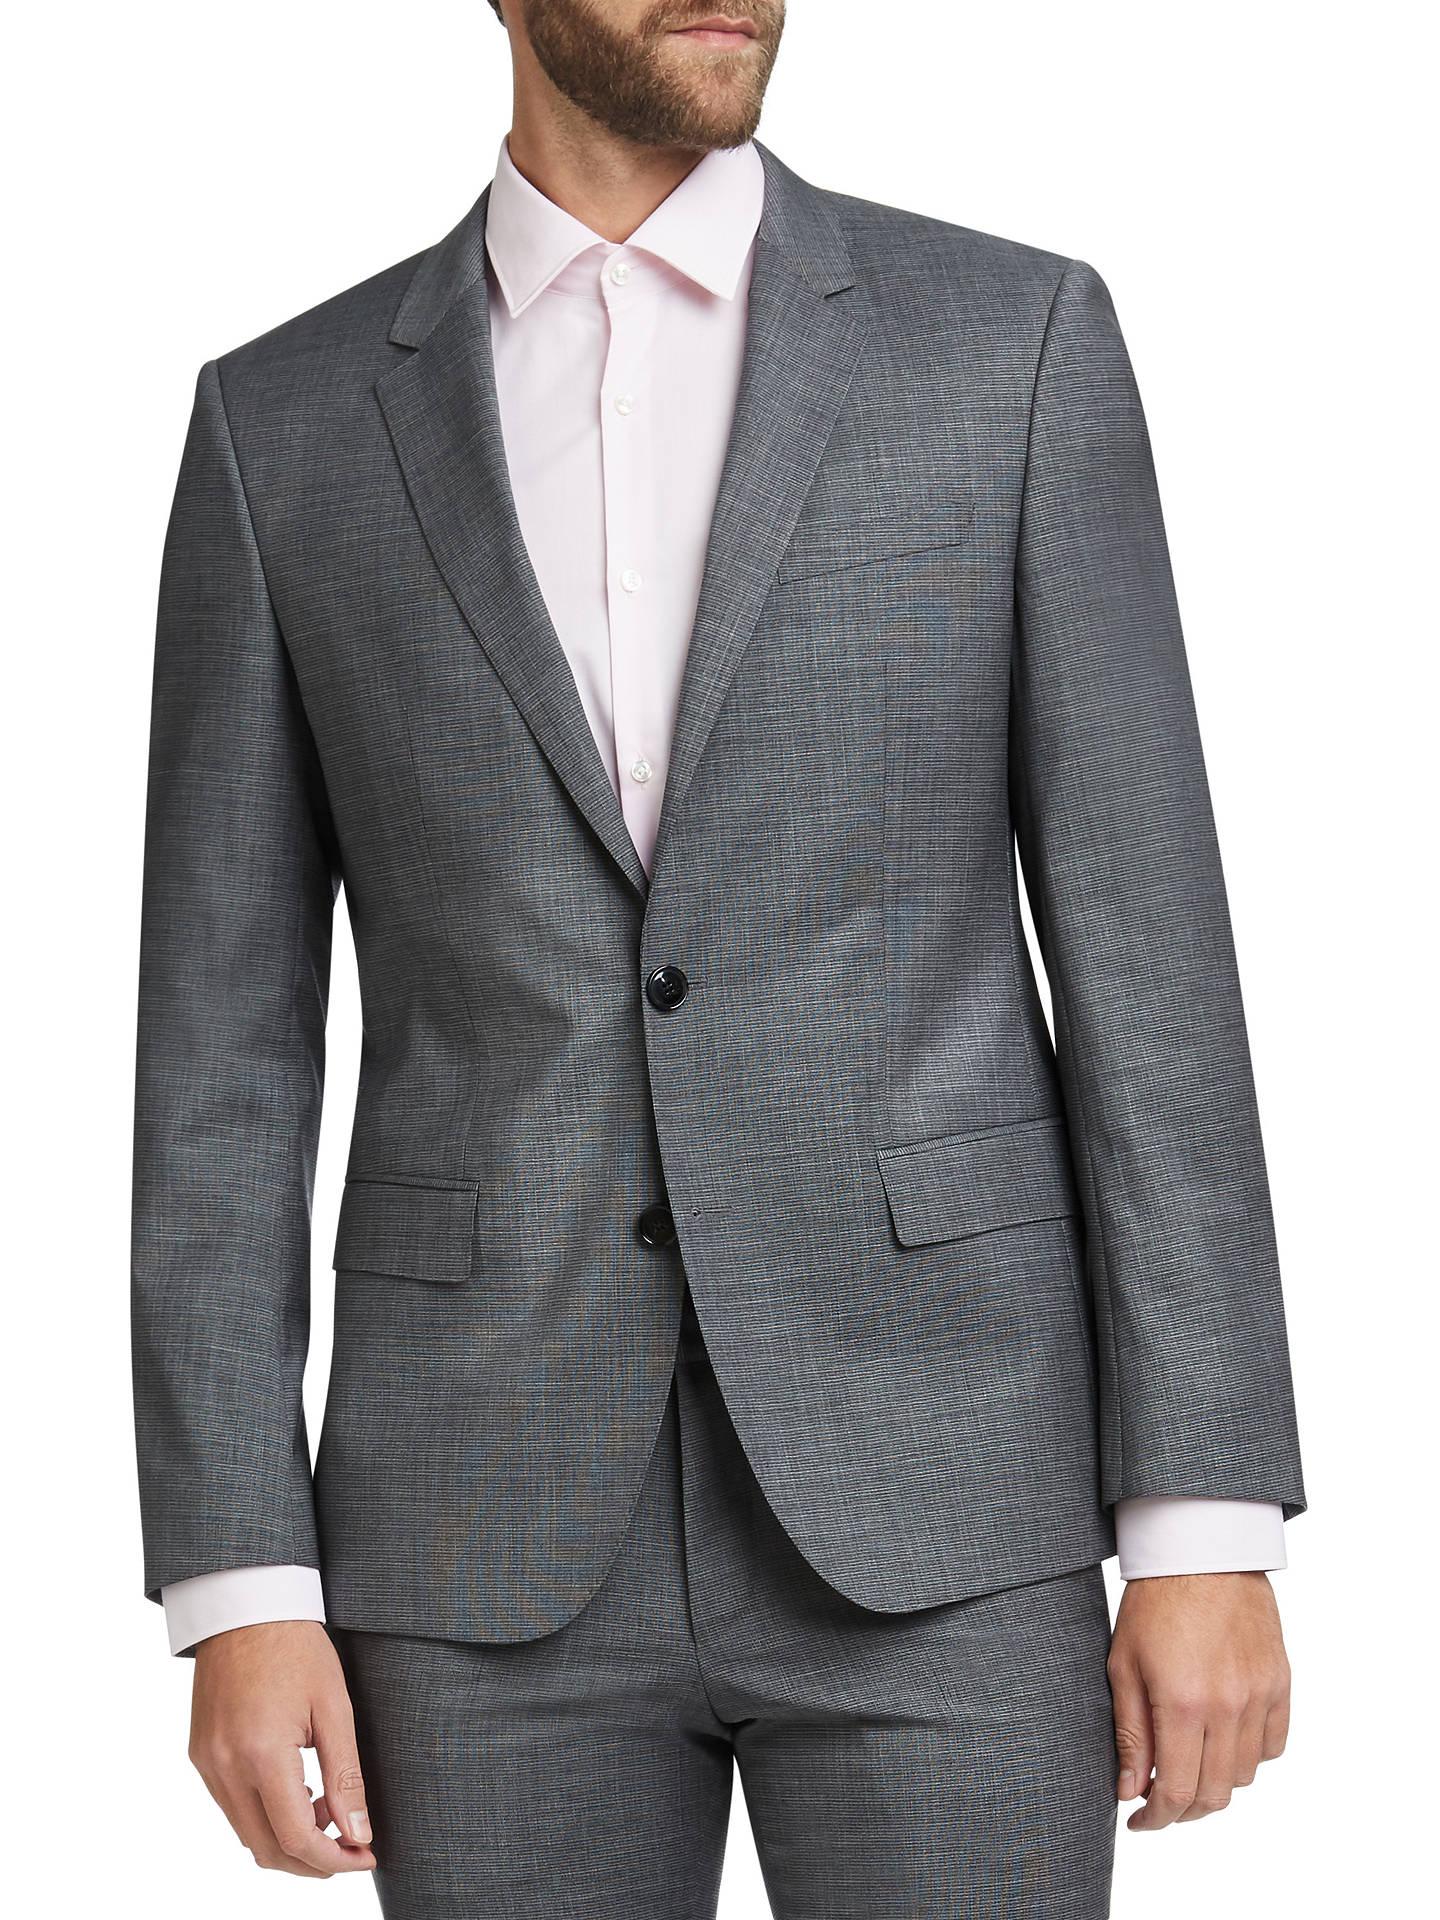 6694aa589 Buy HUGO by Hugo Boss Henry/Griffin Virgin Wool Slim Fit Suit Jacket, Open  ...